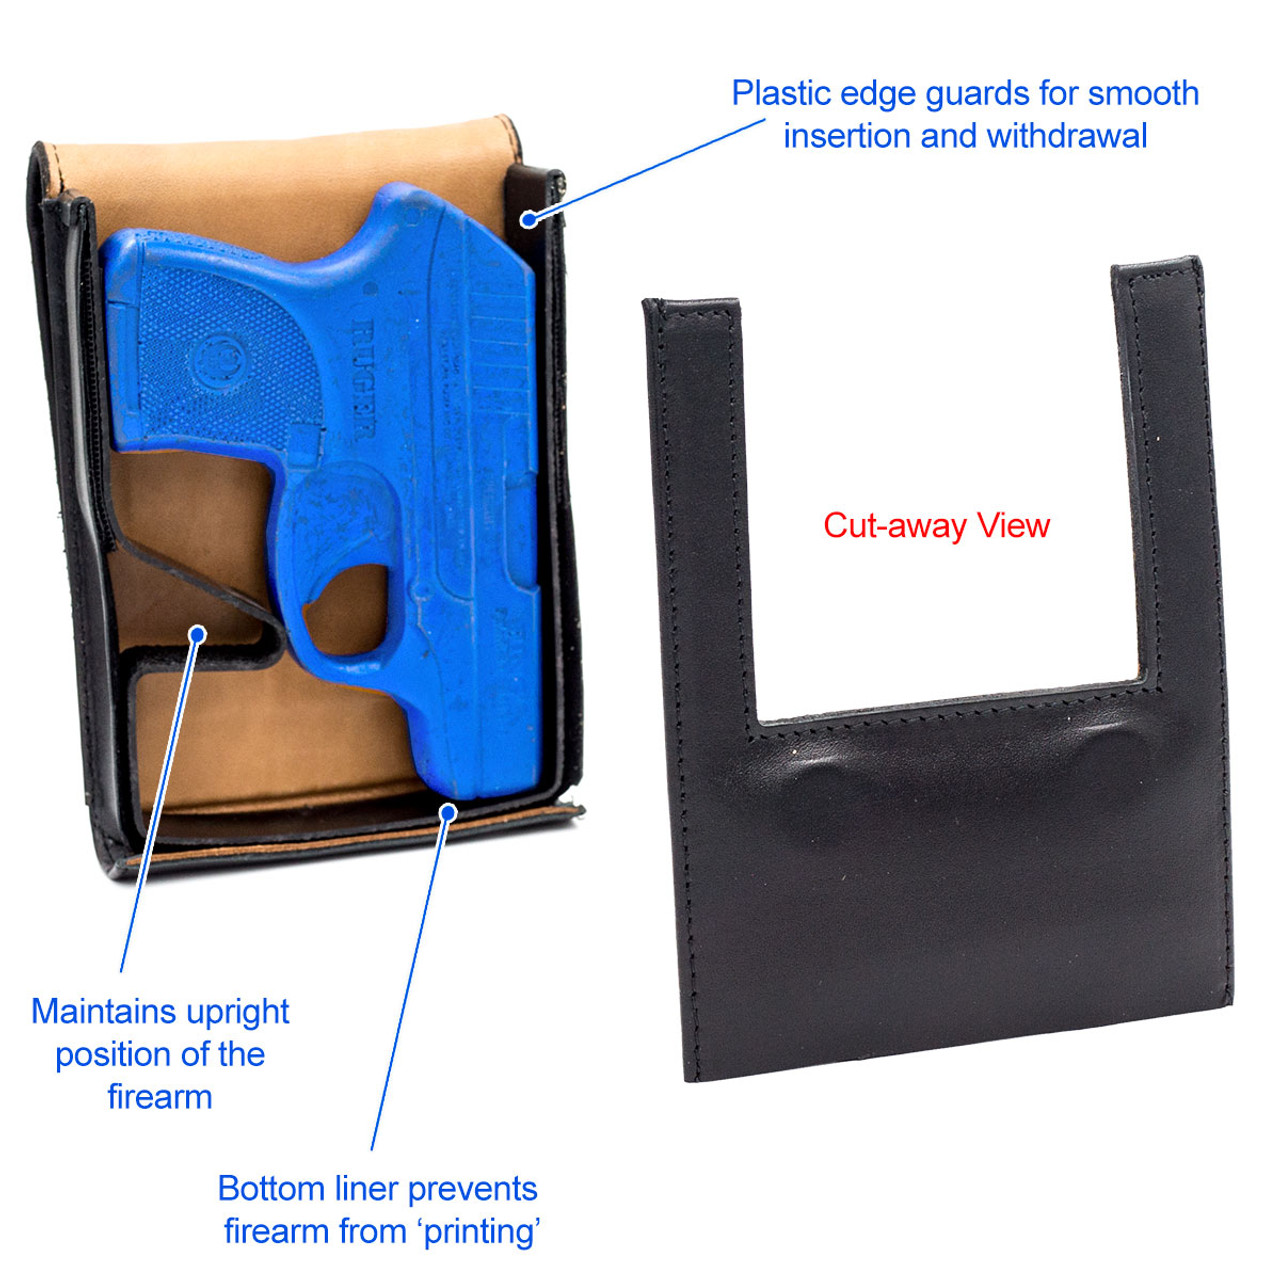 HK VP9 Concealed Carry Holster (Belt Loop)